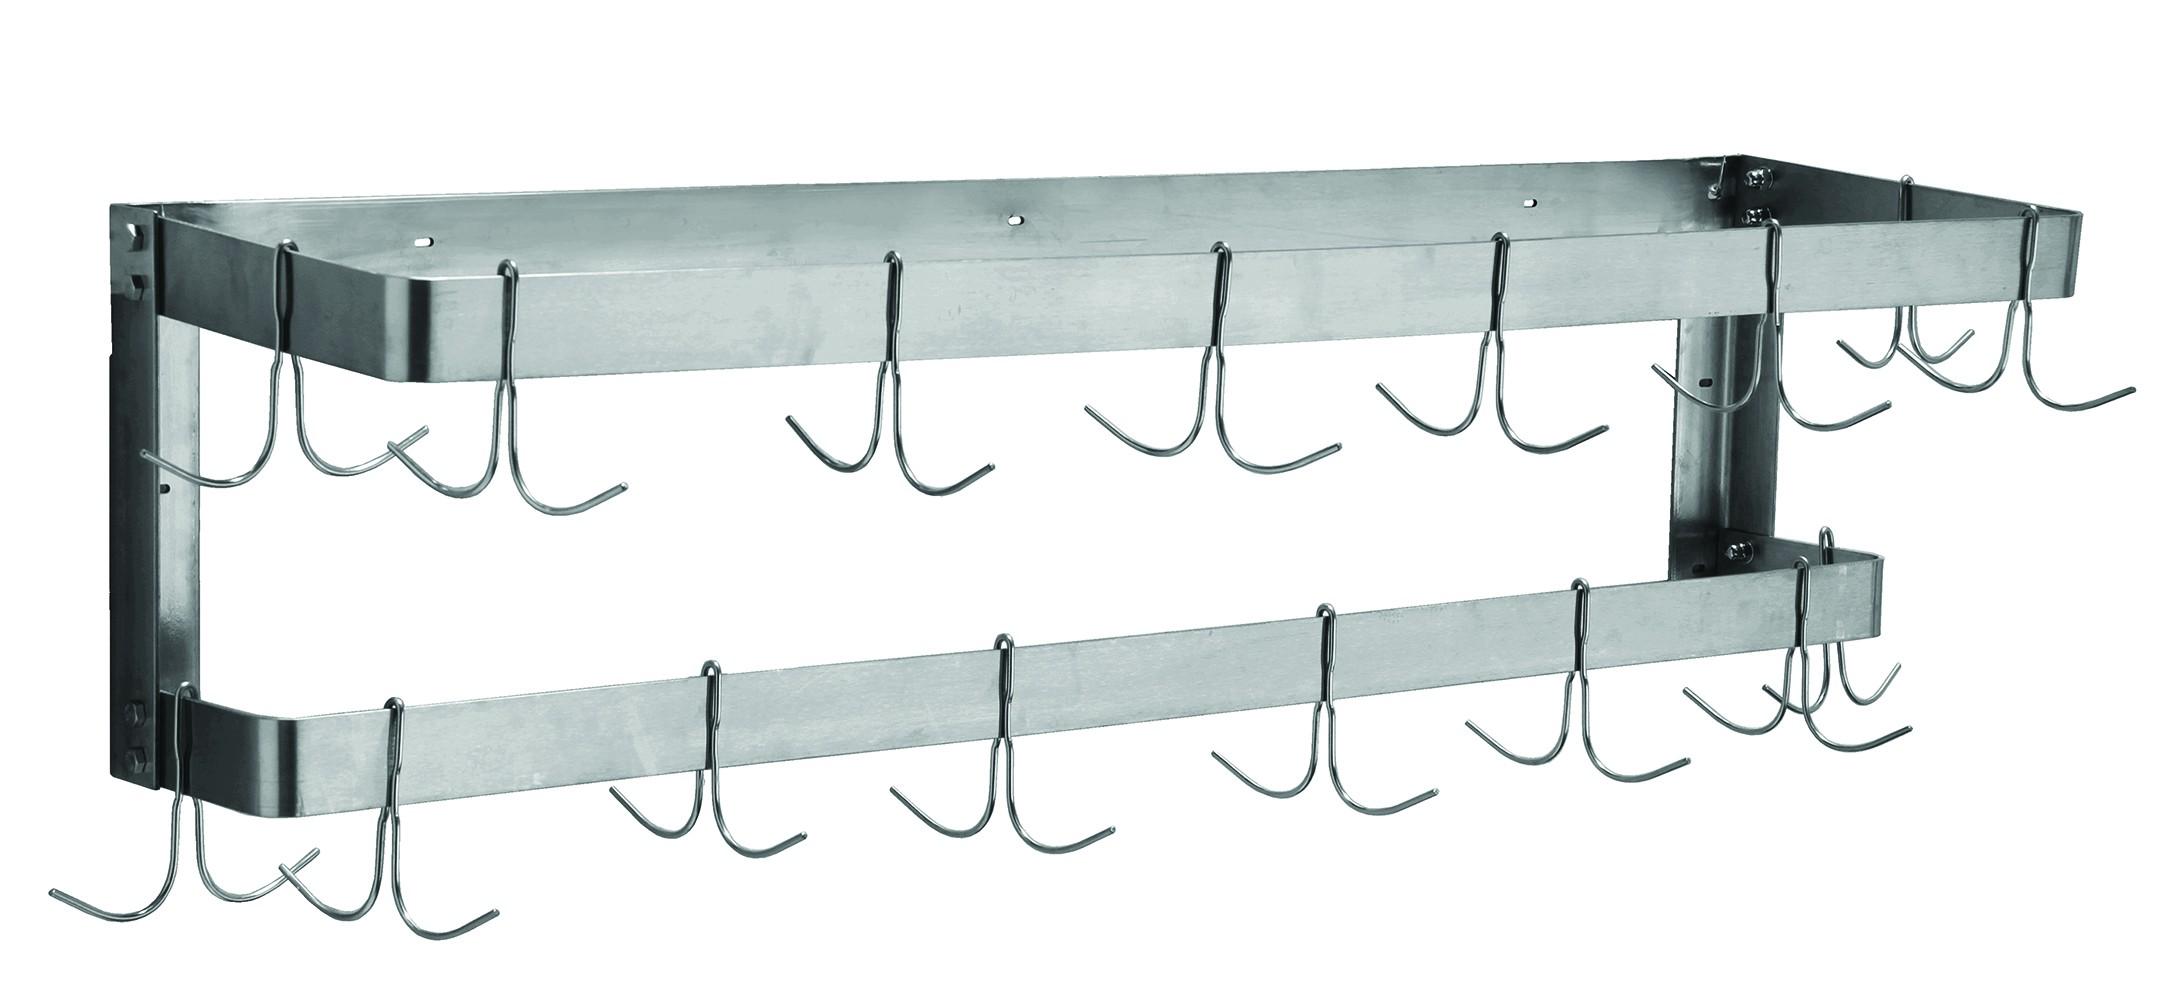 shelf mounted draining pot commercial stainless steel wall goods shelves